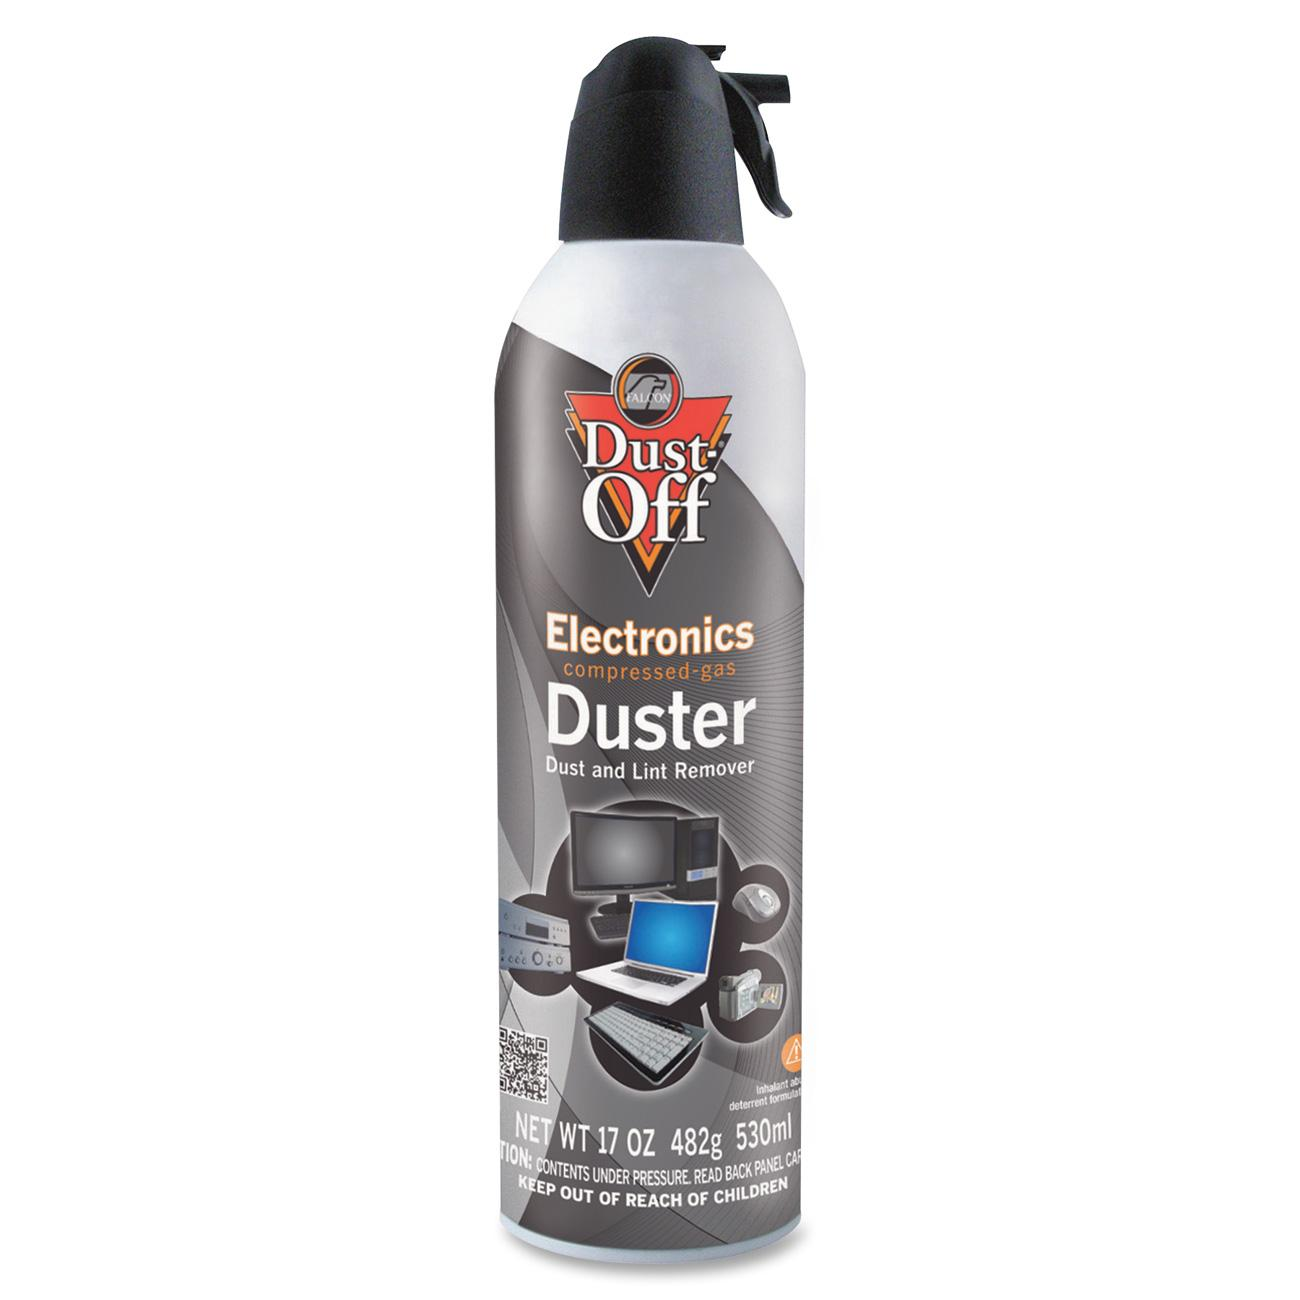 Falcon, FALDPSJMB, Dust-Off Jumbo Disposable Dusters, 1 Each, Gray